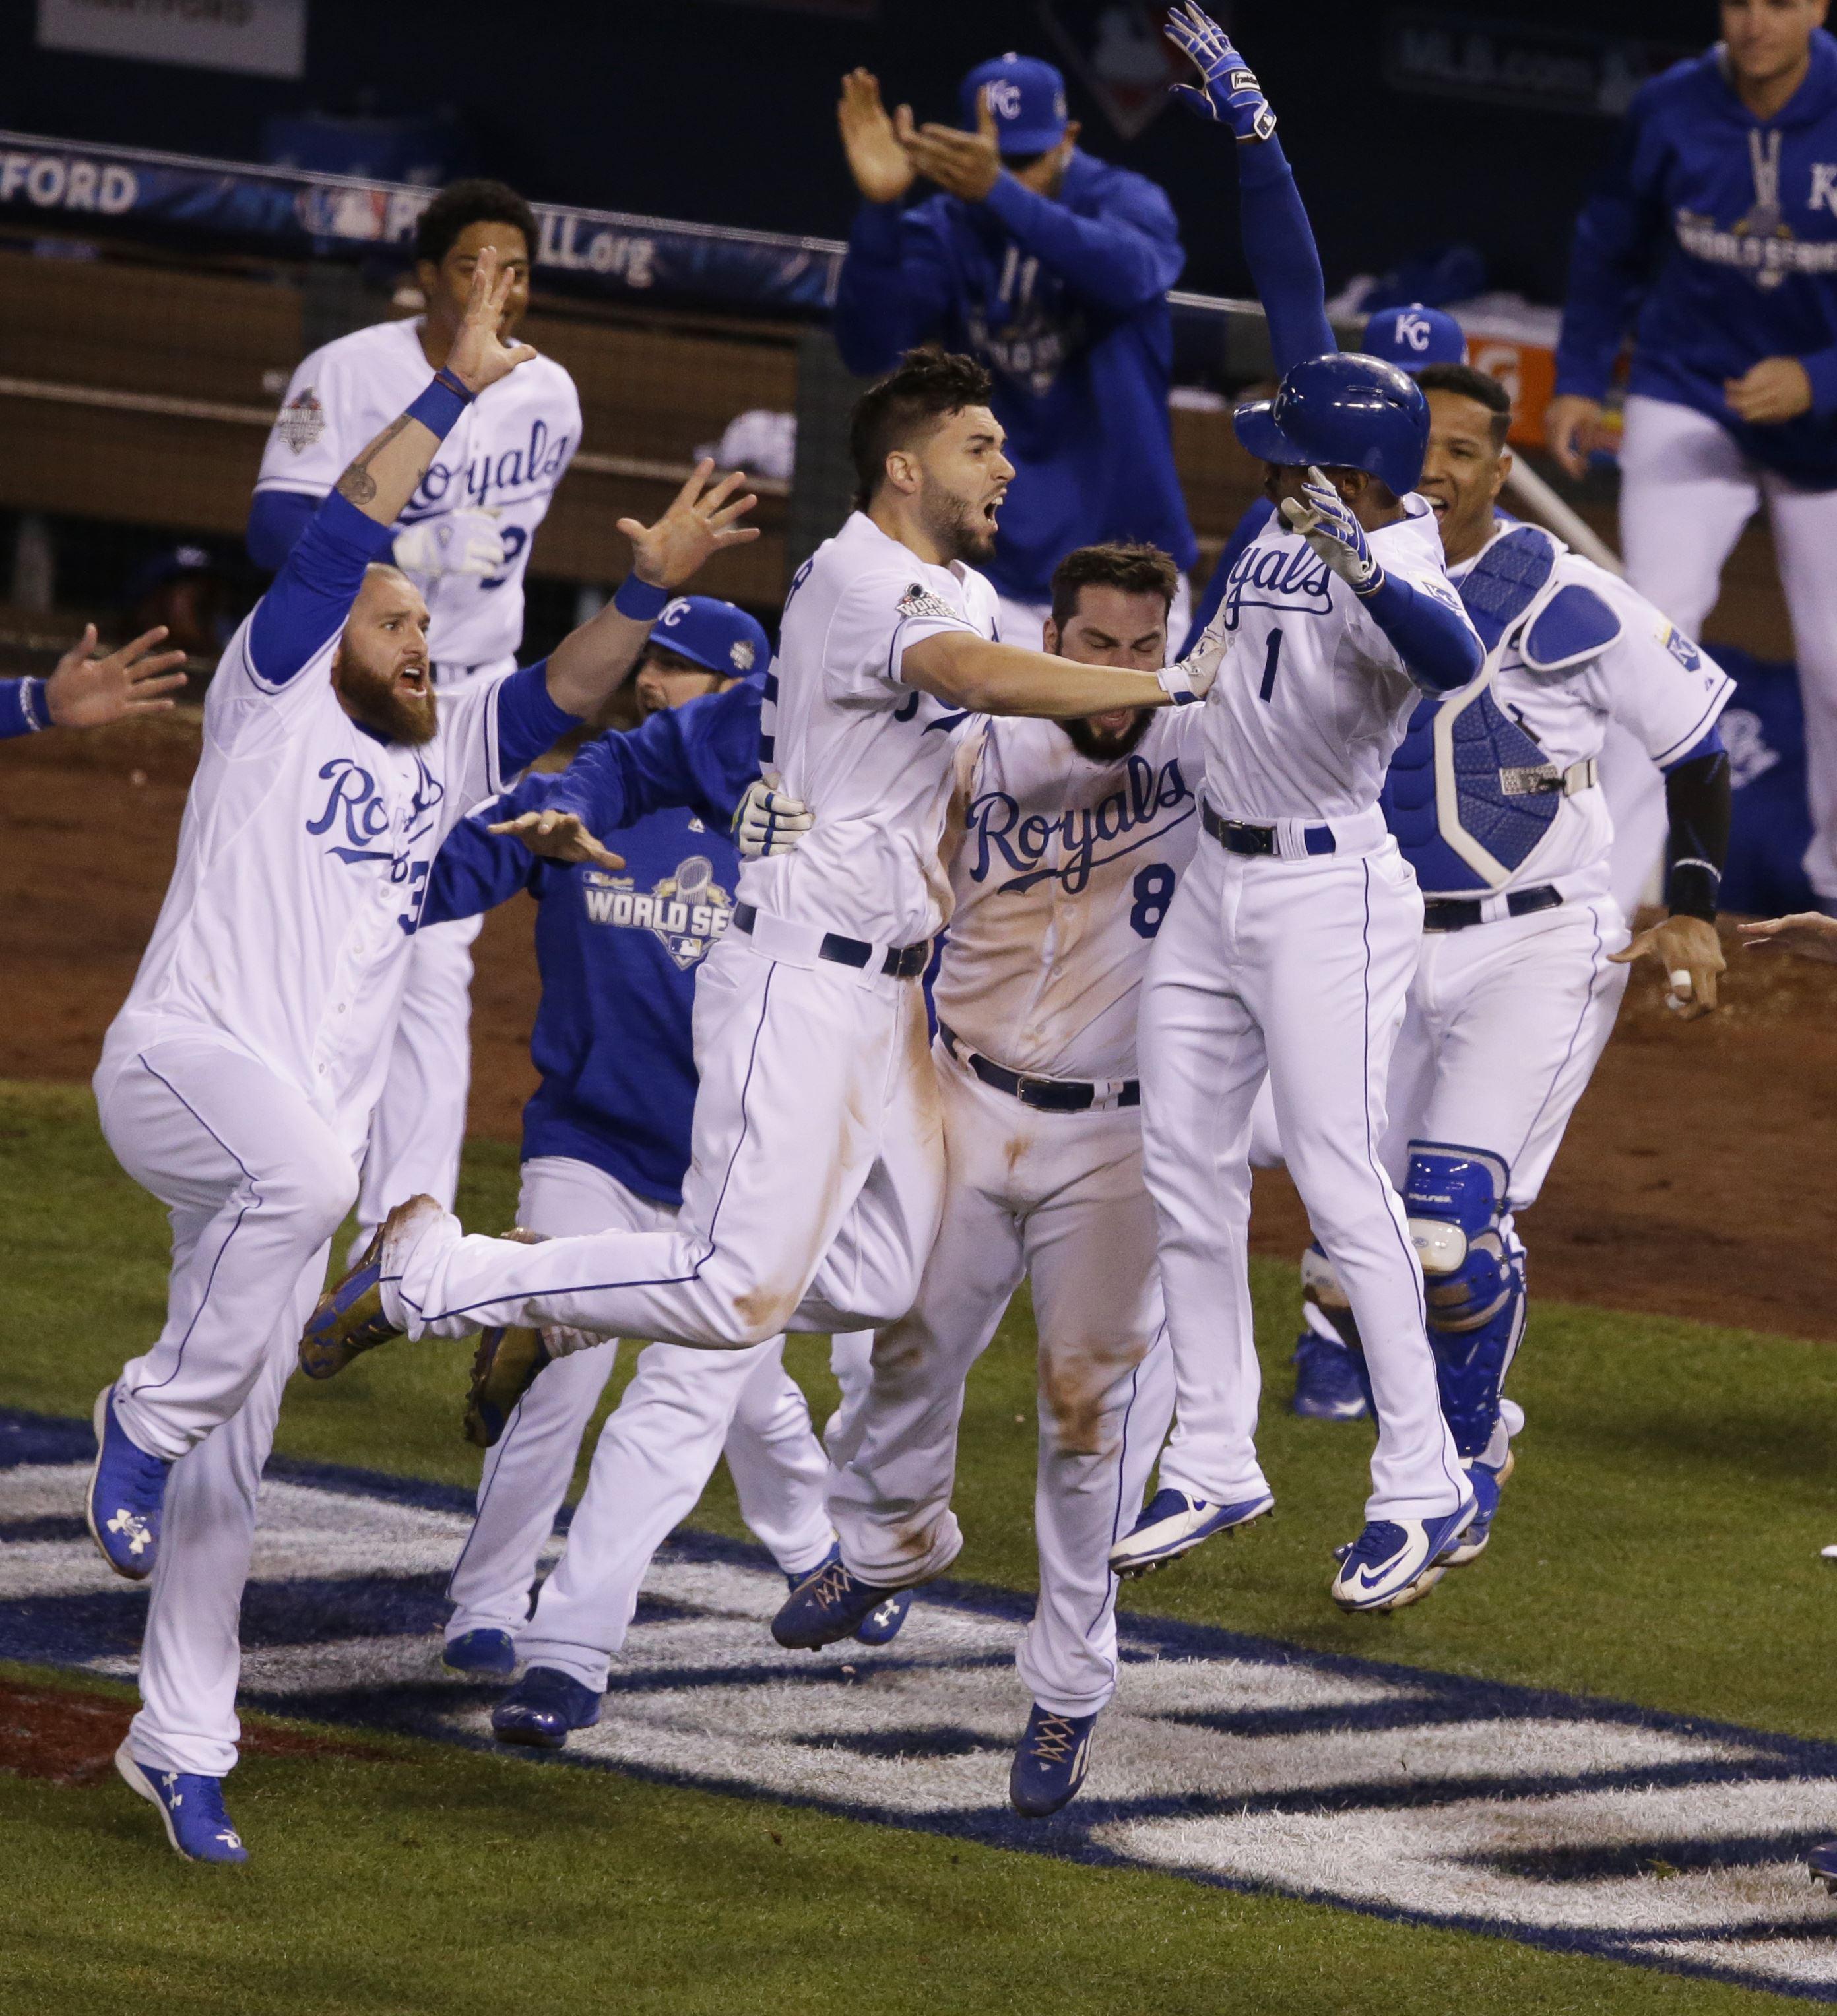 World-Series-Mets-Royals-Baseball-3.jpg